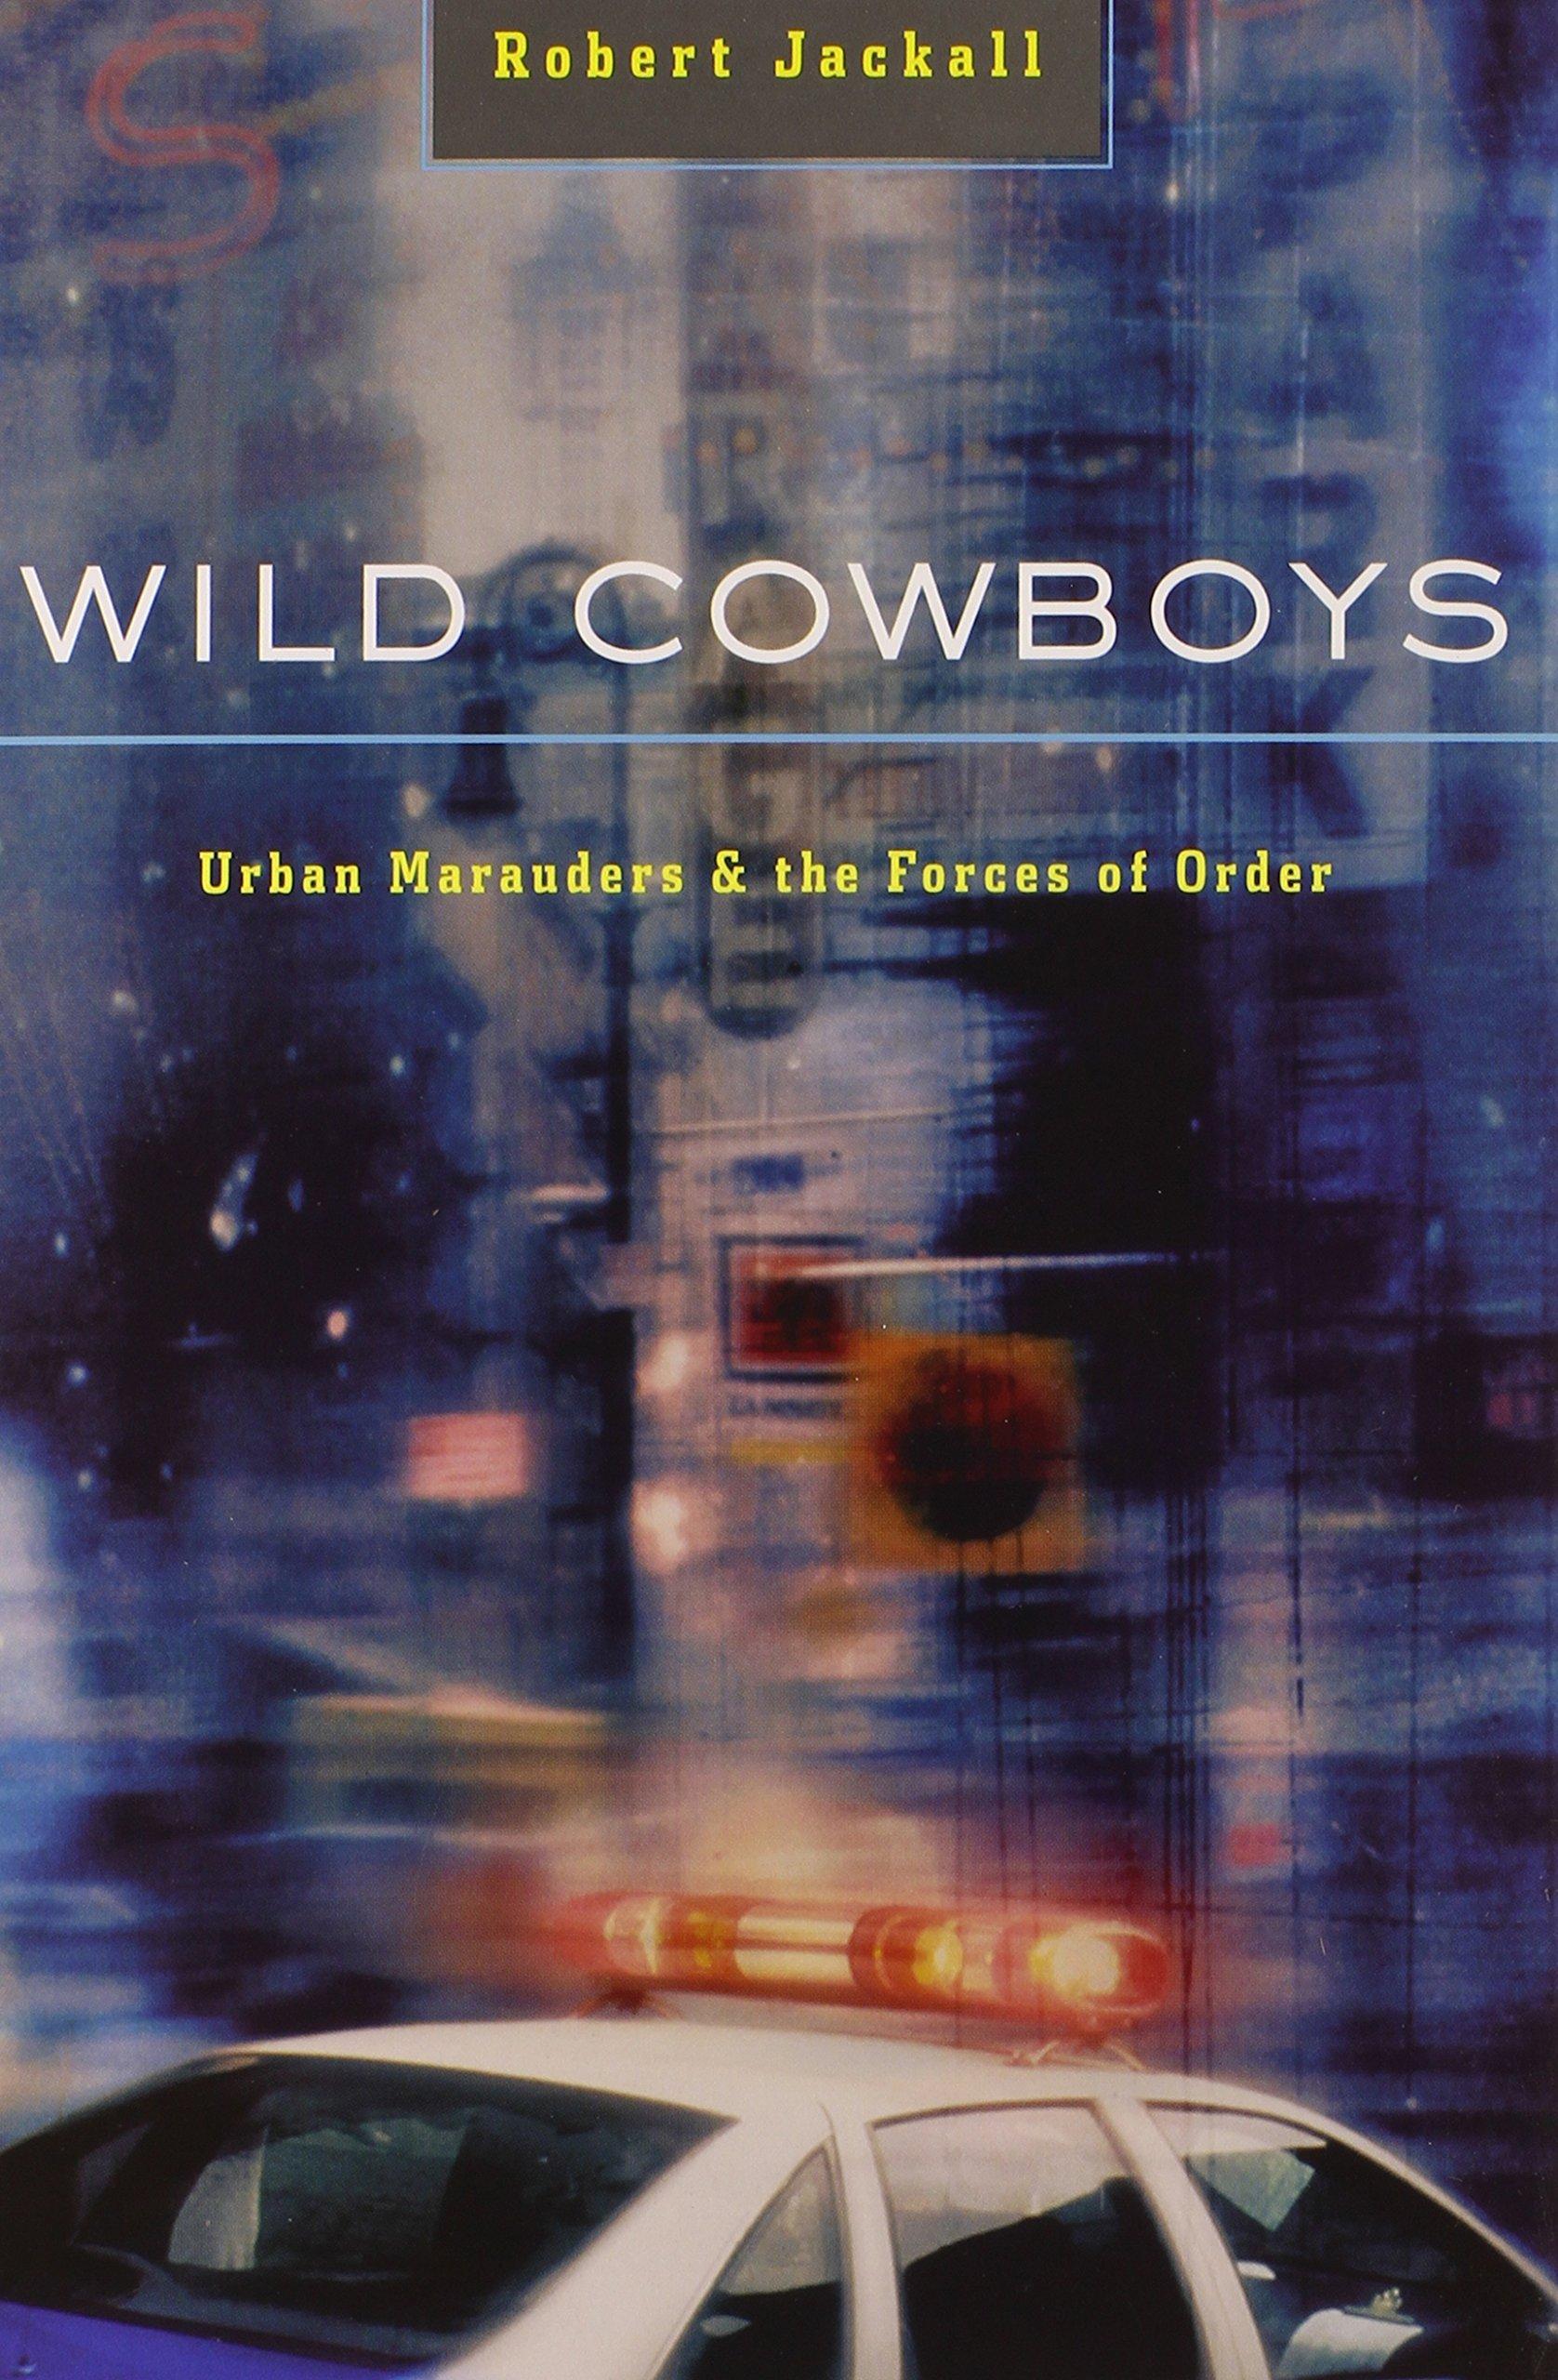 Wild Cowboys Urban Marauders The Forces Of Order Robert Jackall Cd Writer 8211 How Burner Works 9780674018389 Books